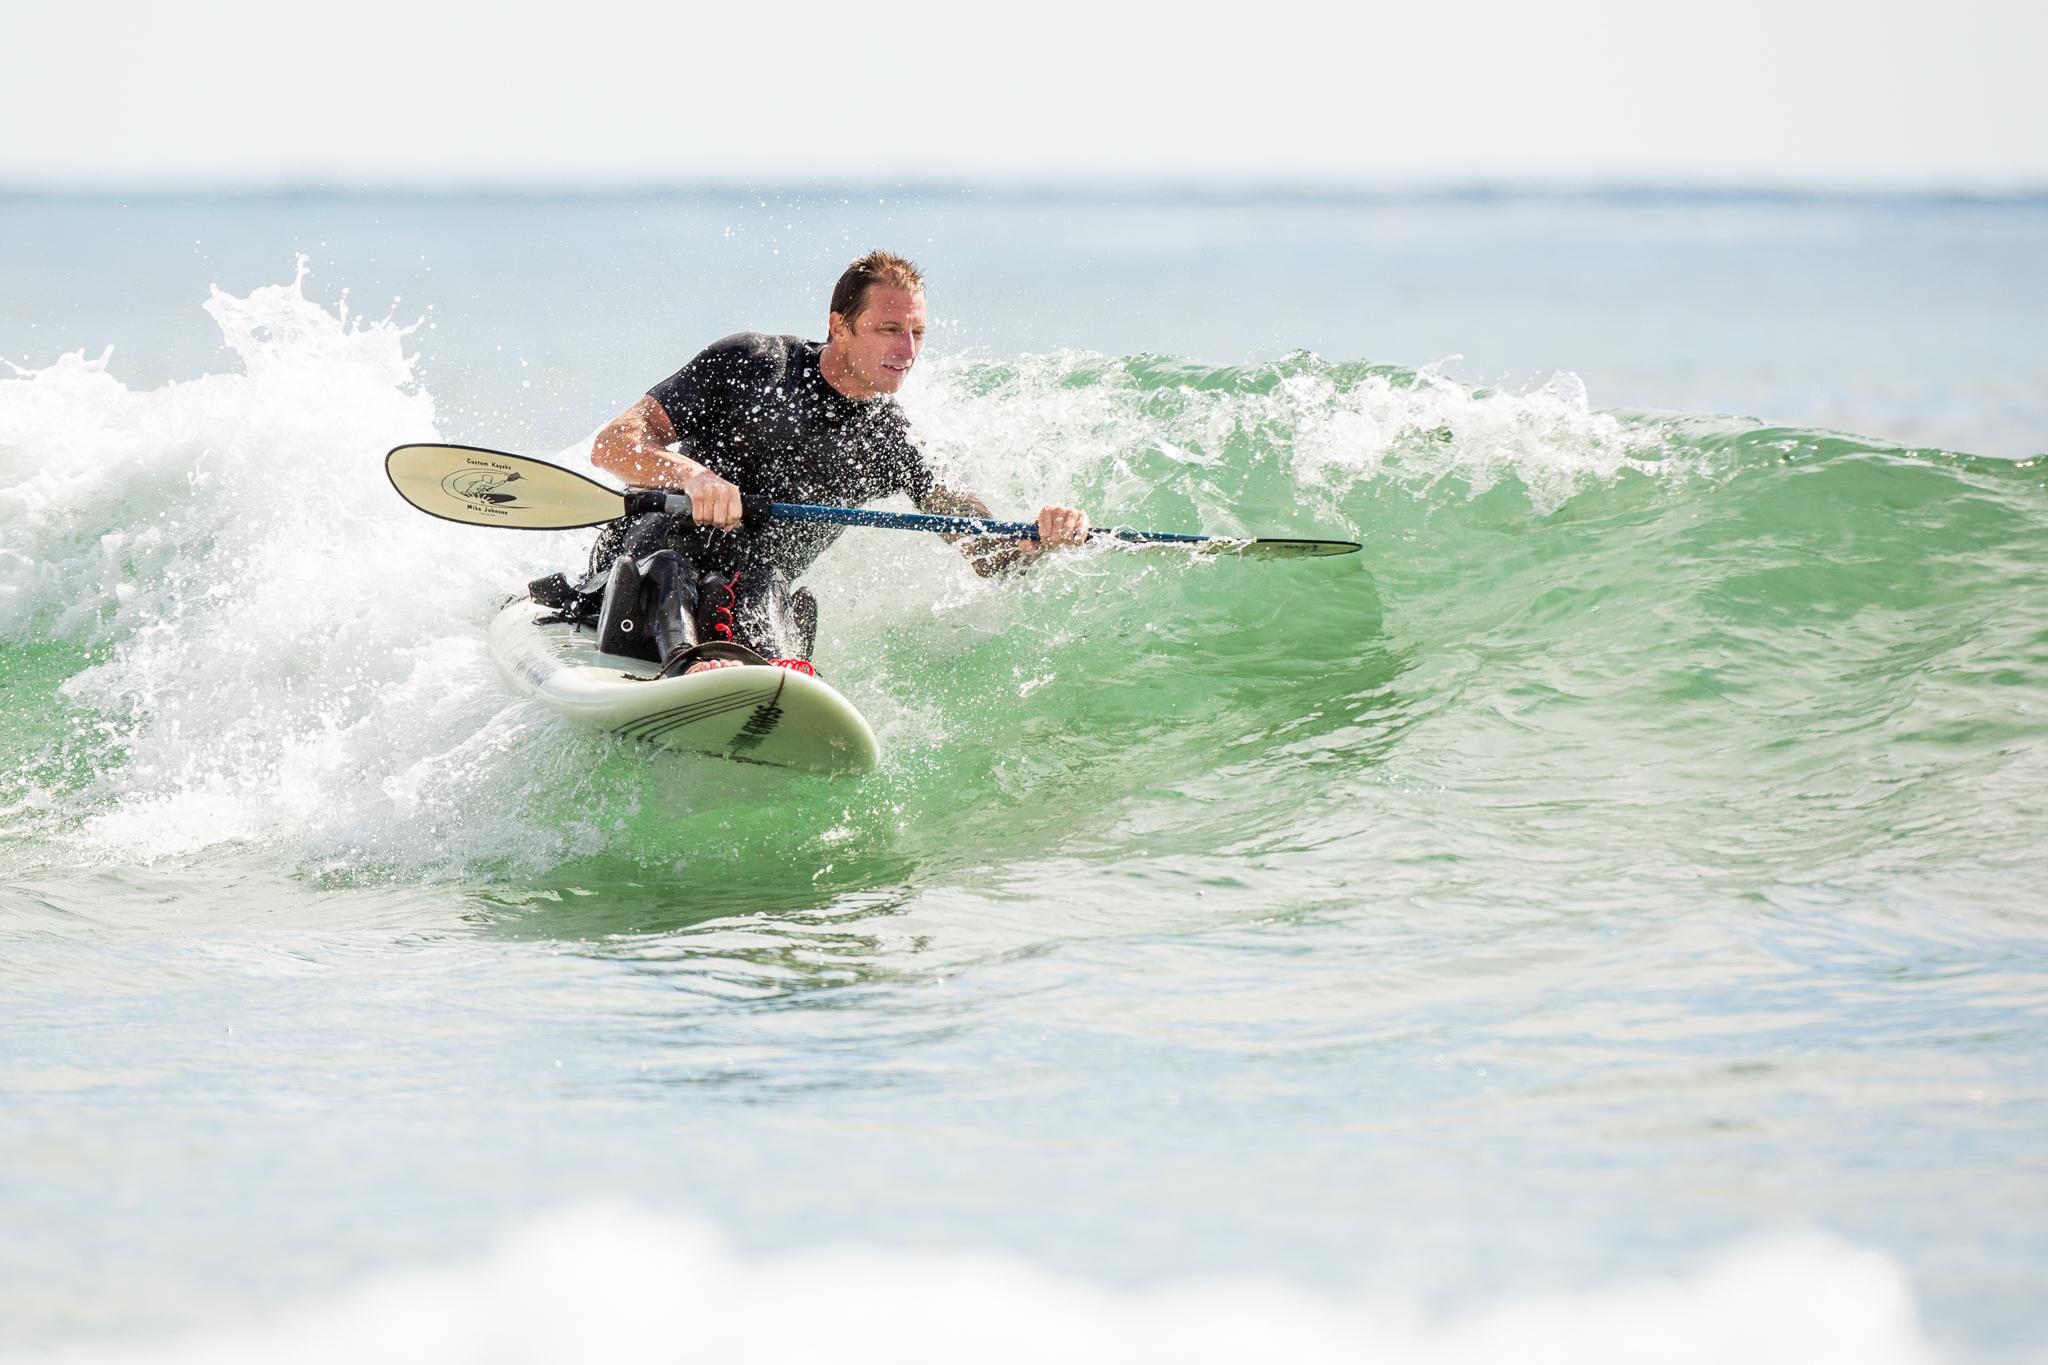 Catchin' a wave. Photo: Minaret Photography